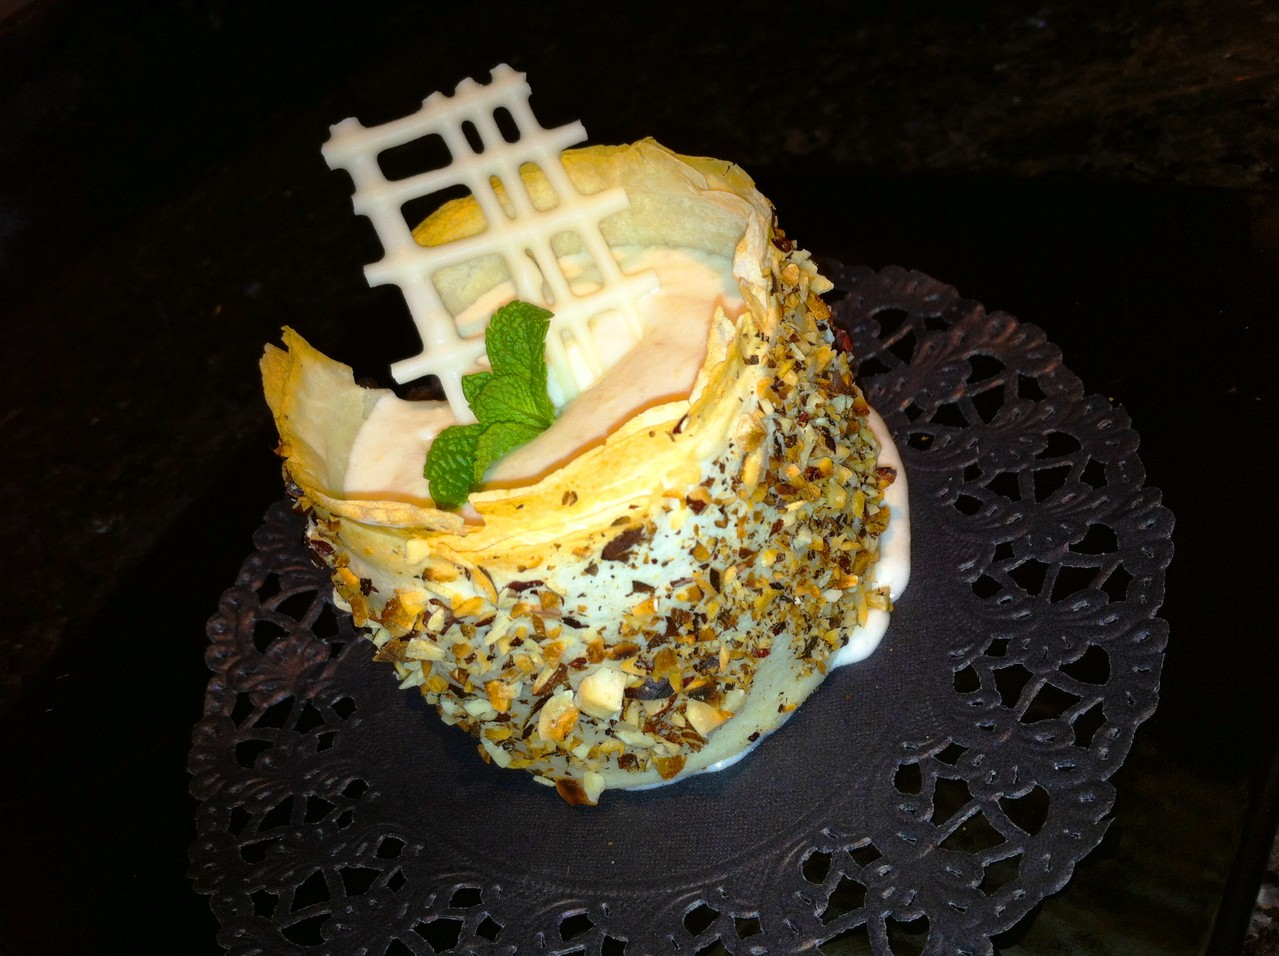 Birnenmousse im Haselnuss-Cannelloni